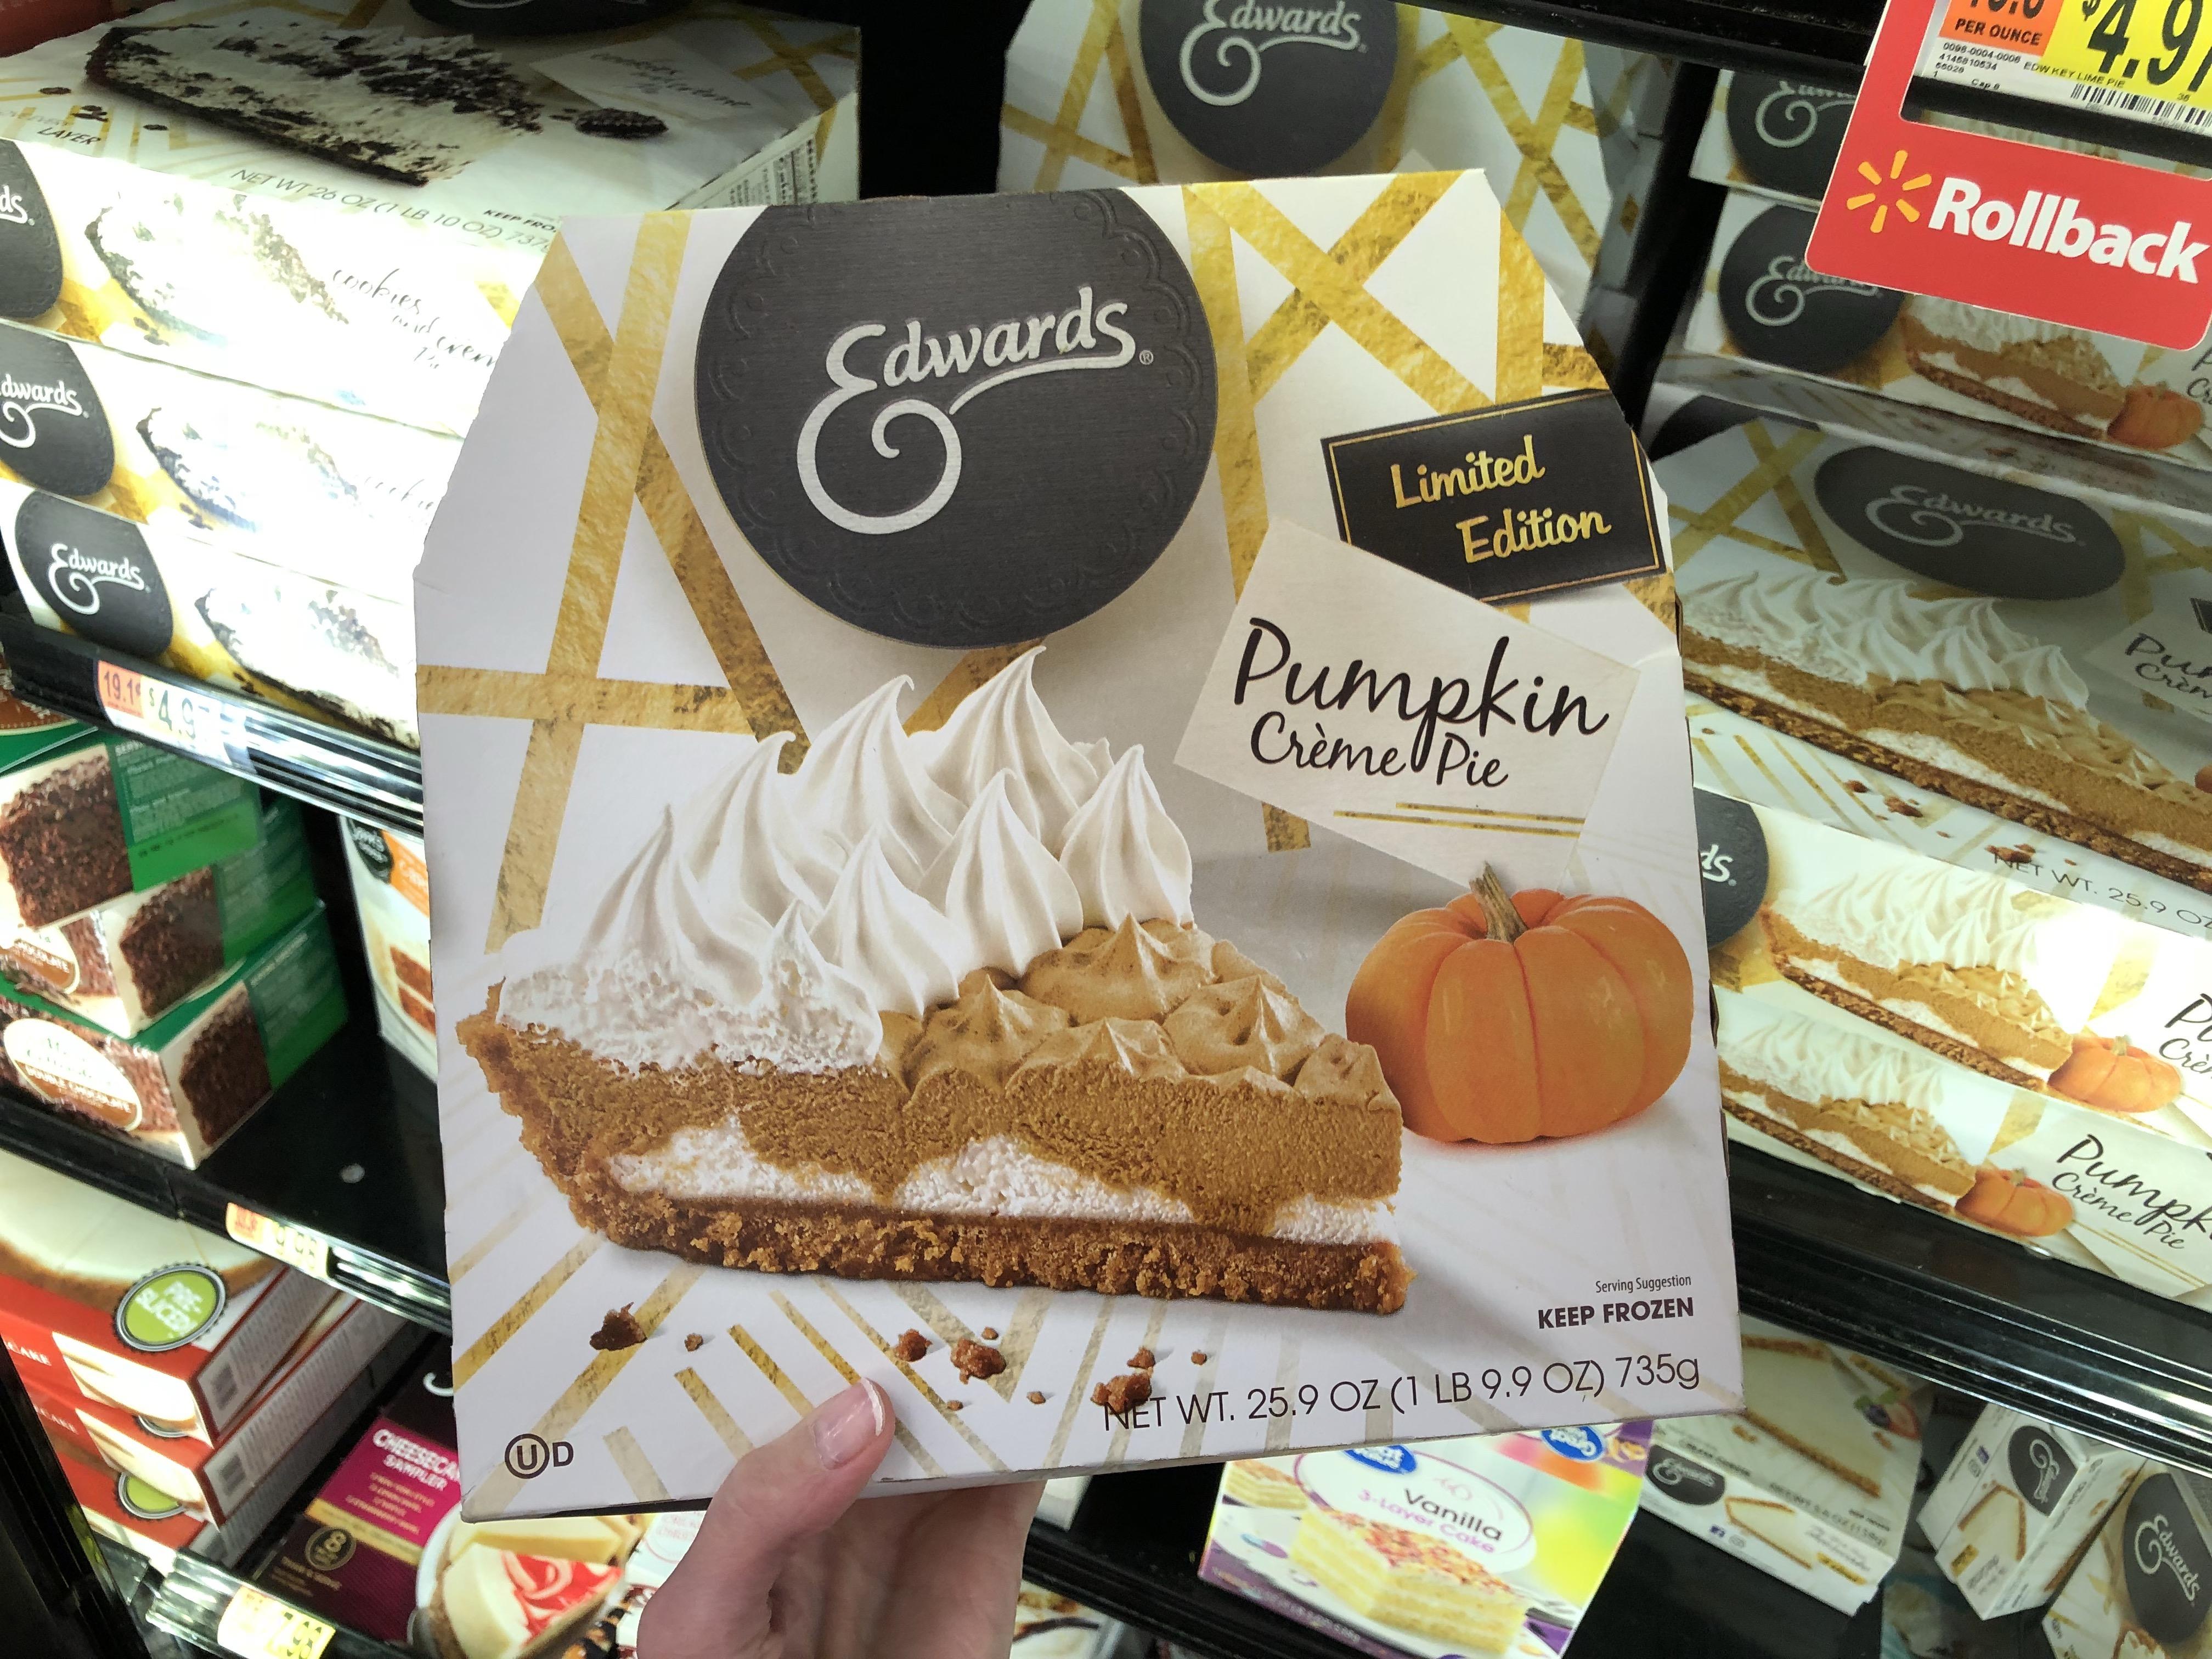 image regarding Edwards Pies Printable Coupons called Contemporary $0.75/1 Edwards Pie Coupon \u003d Just $3.99 at Emphasis + Extra